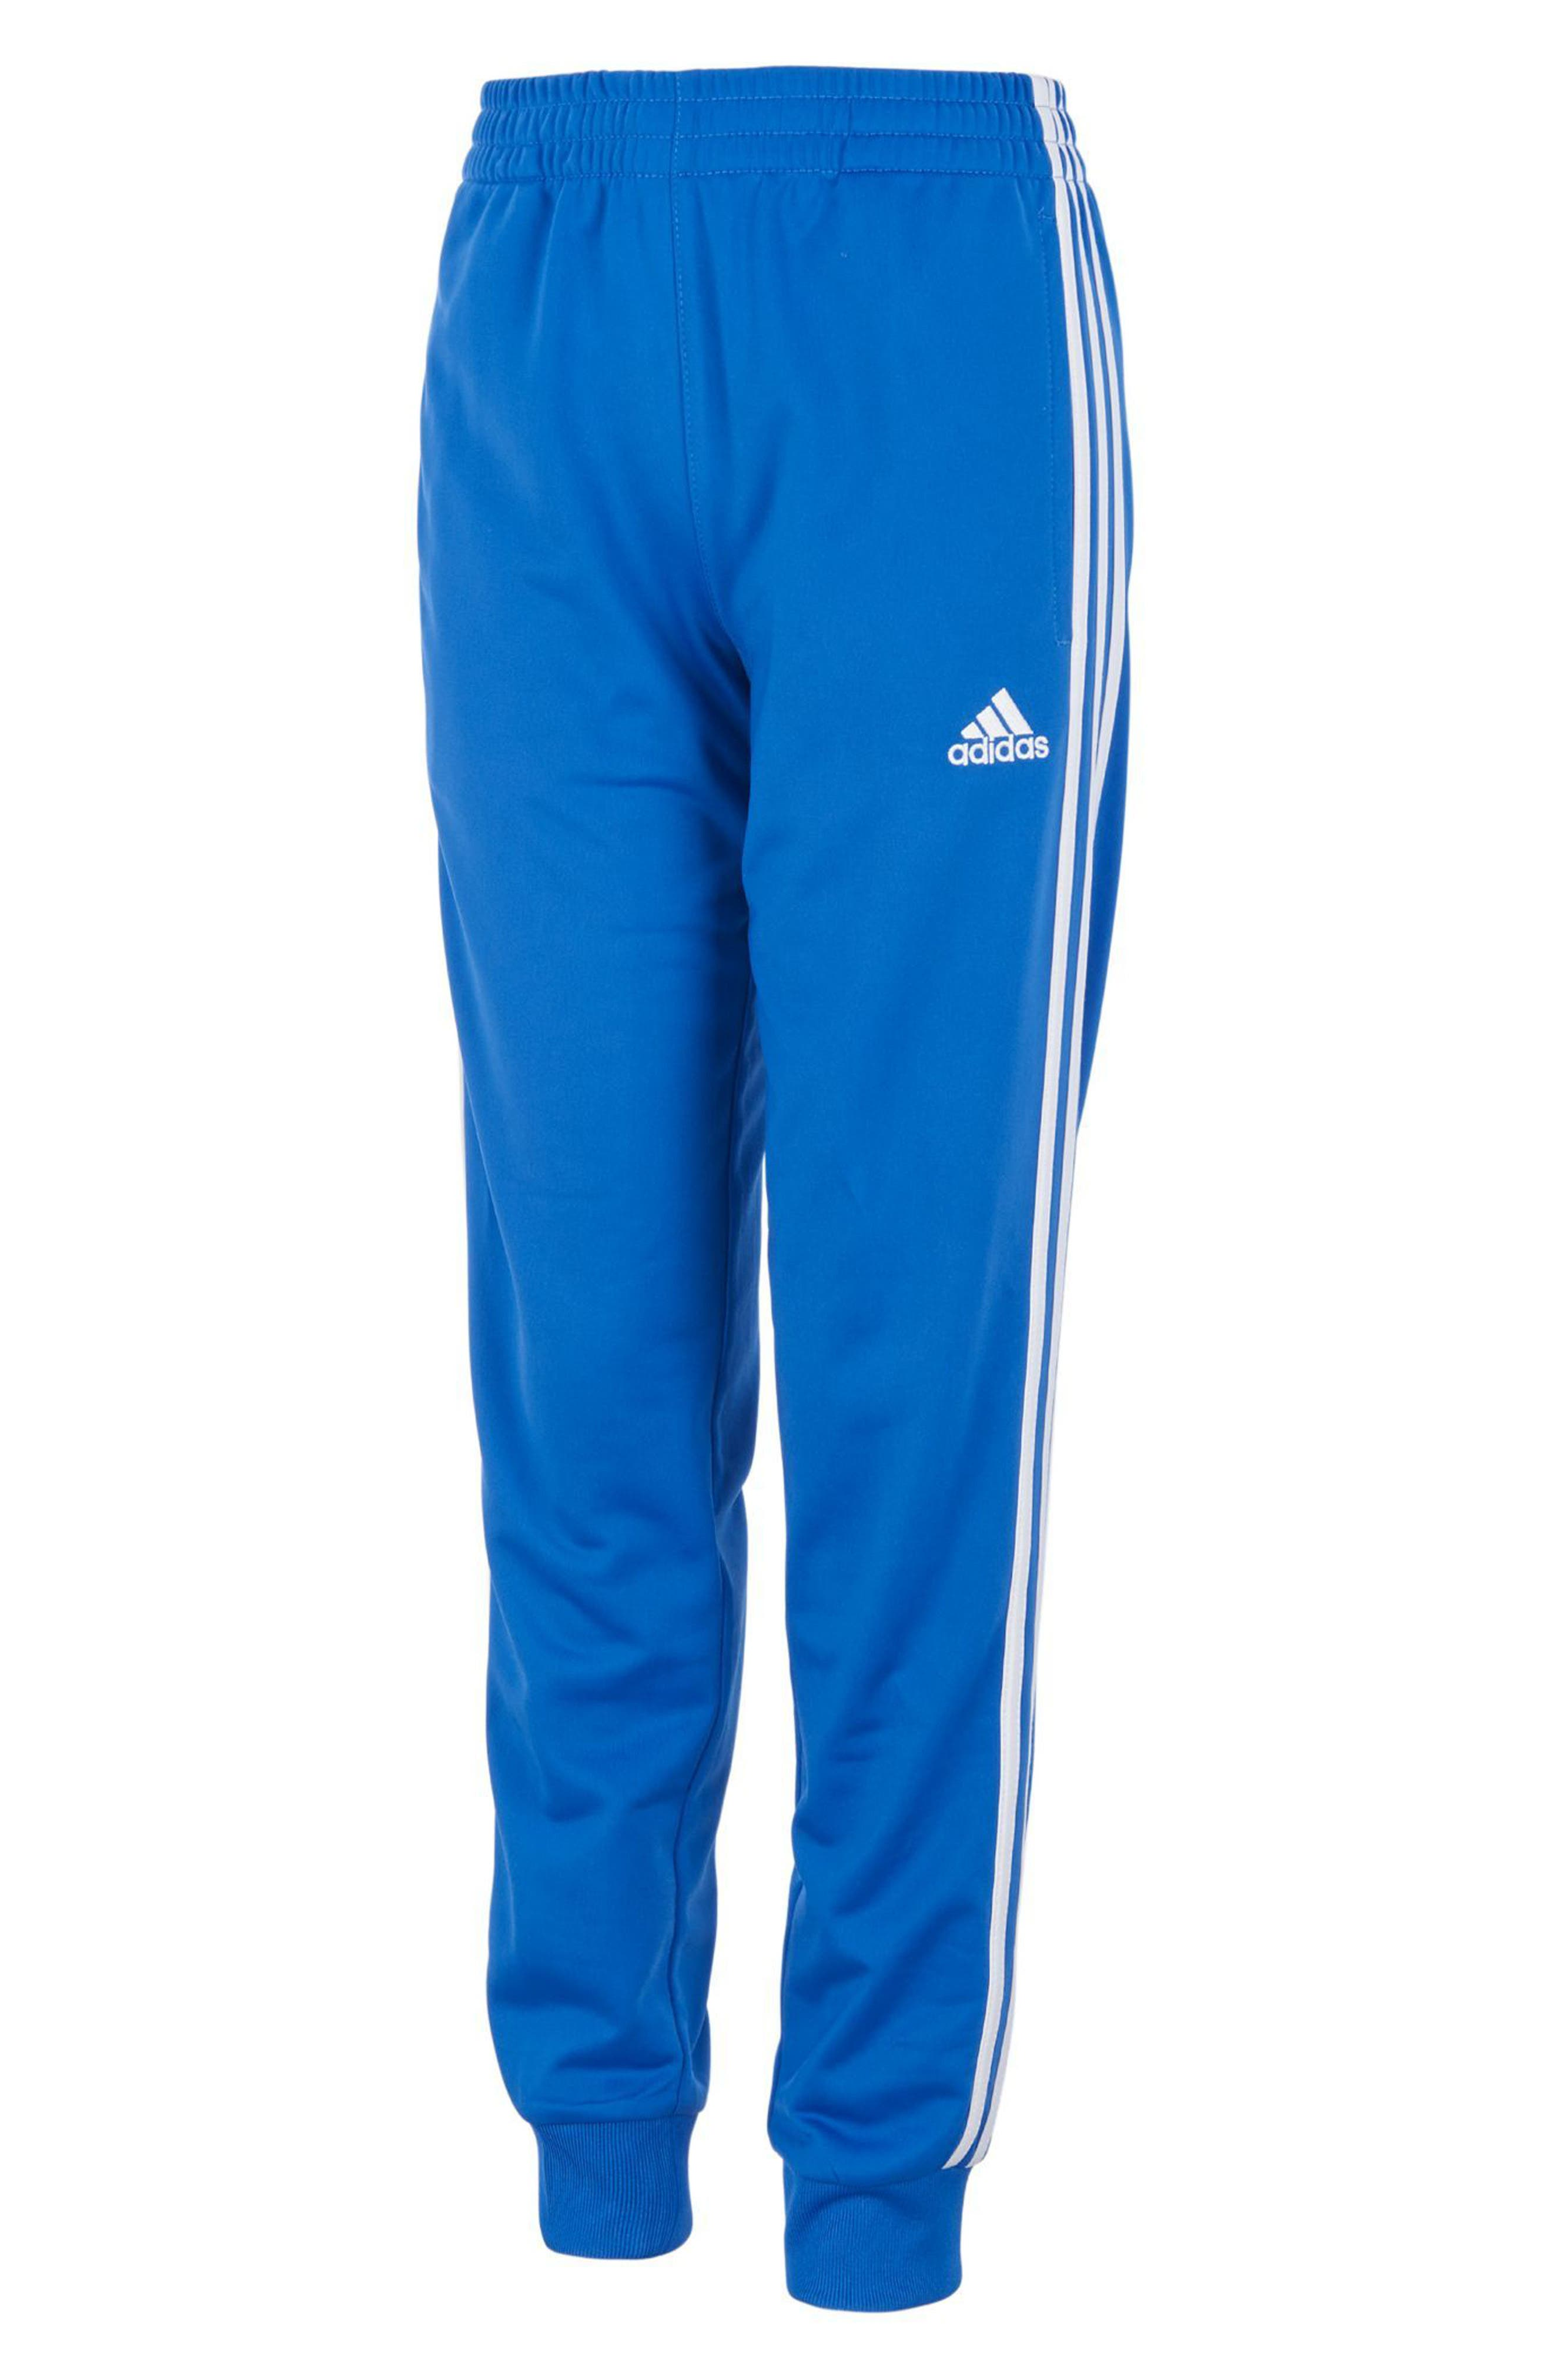 adidas Iconic Jogger Pants (Big Boys)